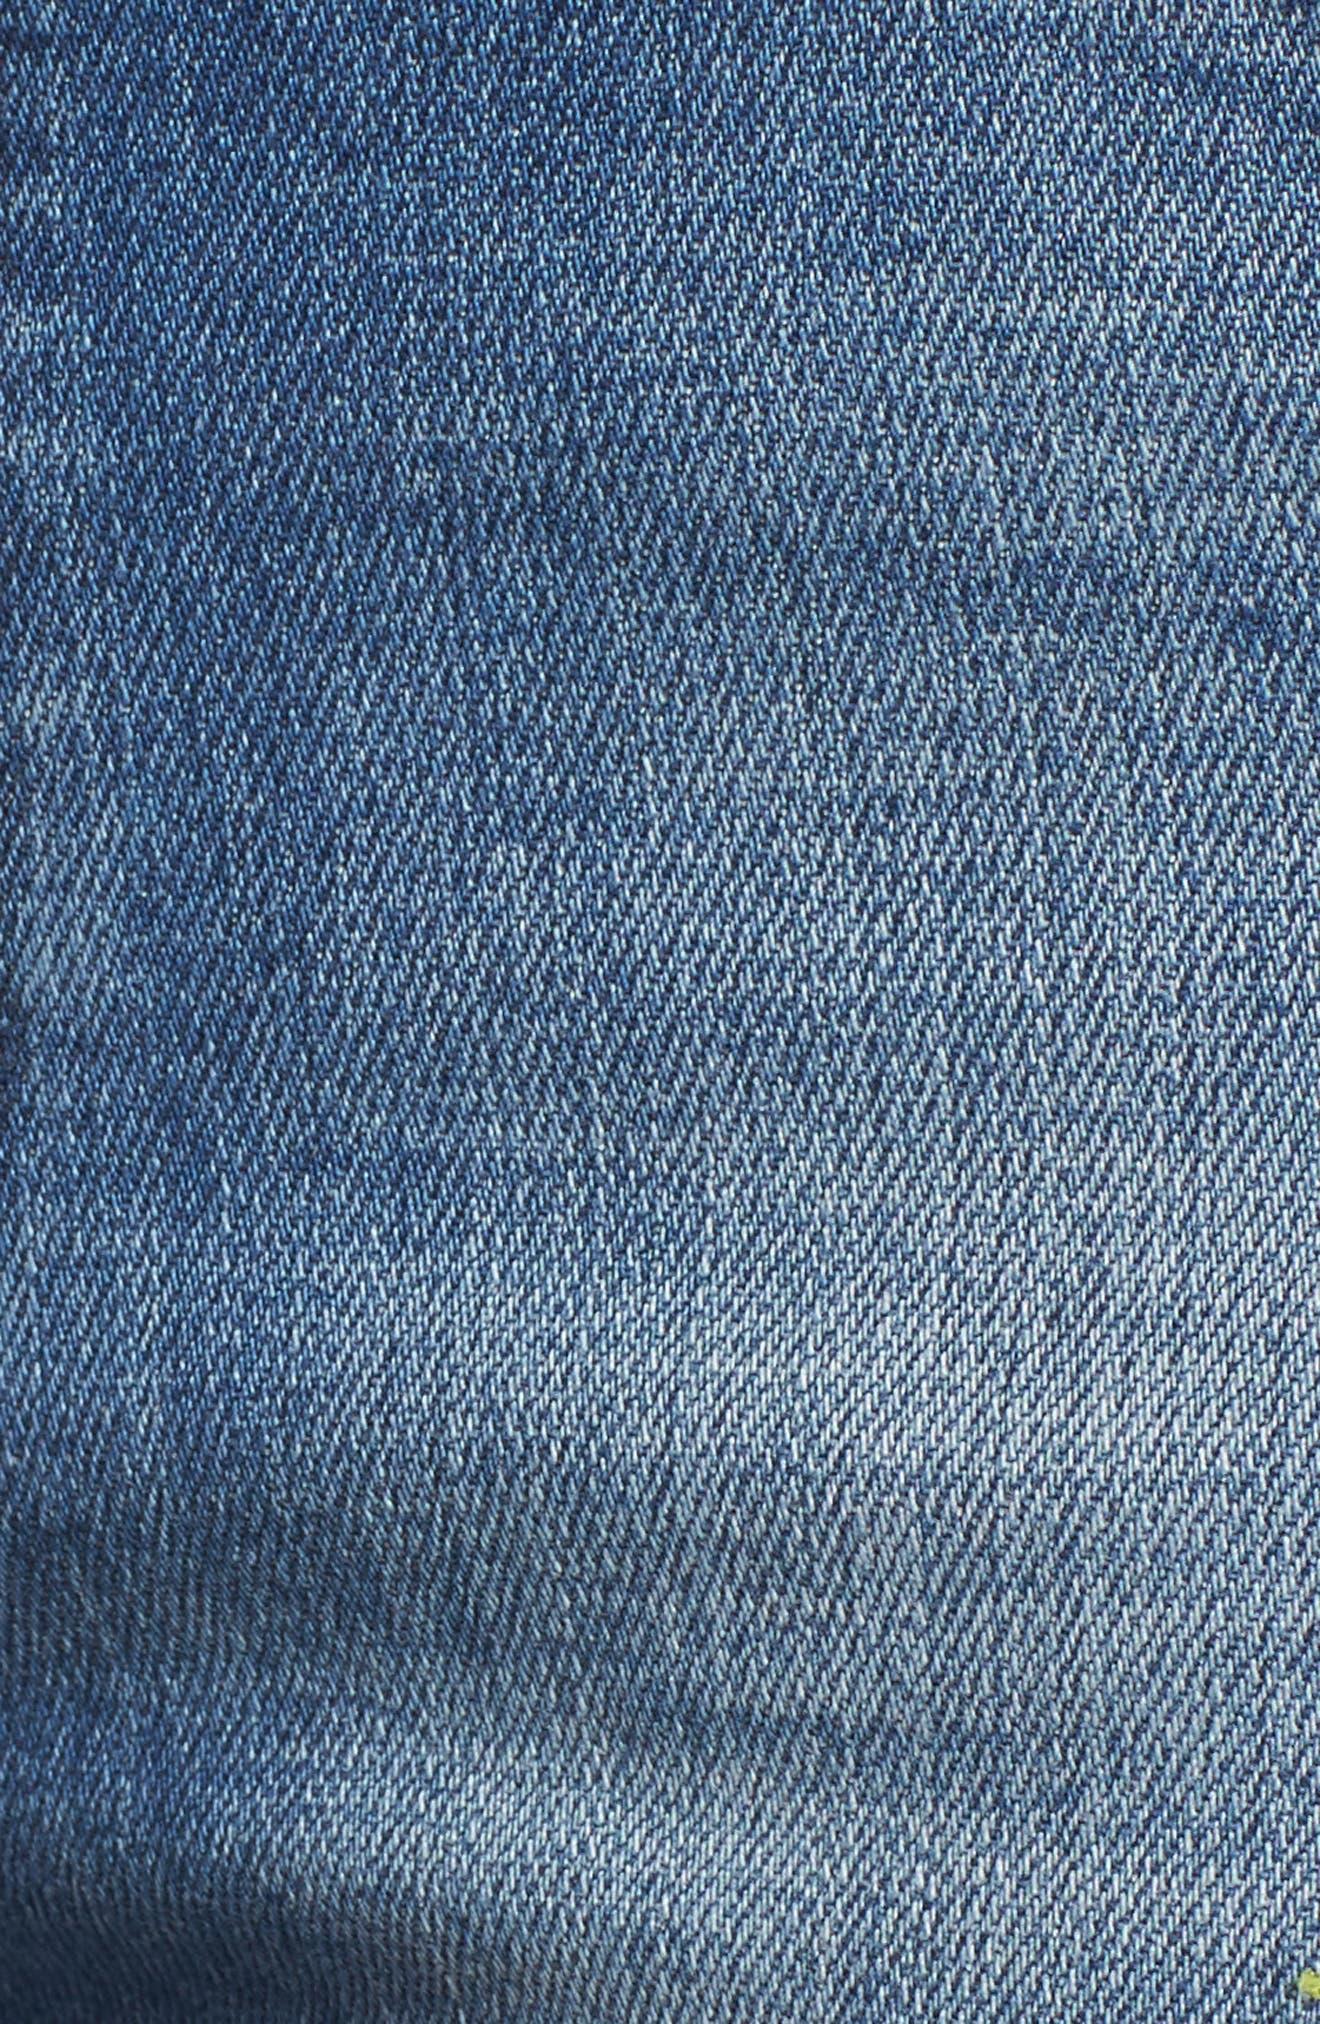 Paradise High Waist Skinny Jeans,                             Alternate thumbnail 6, color,                             400